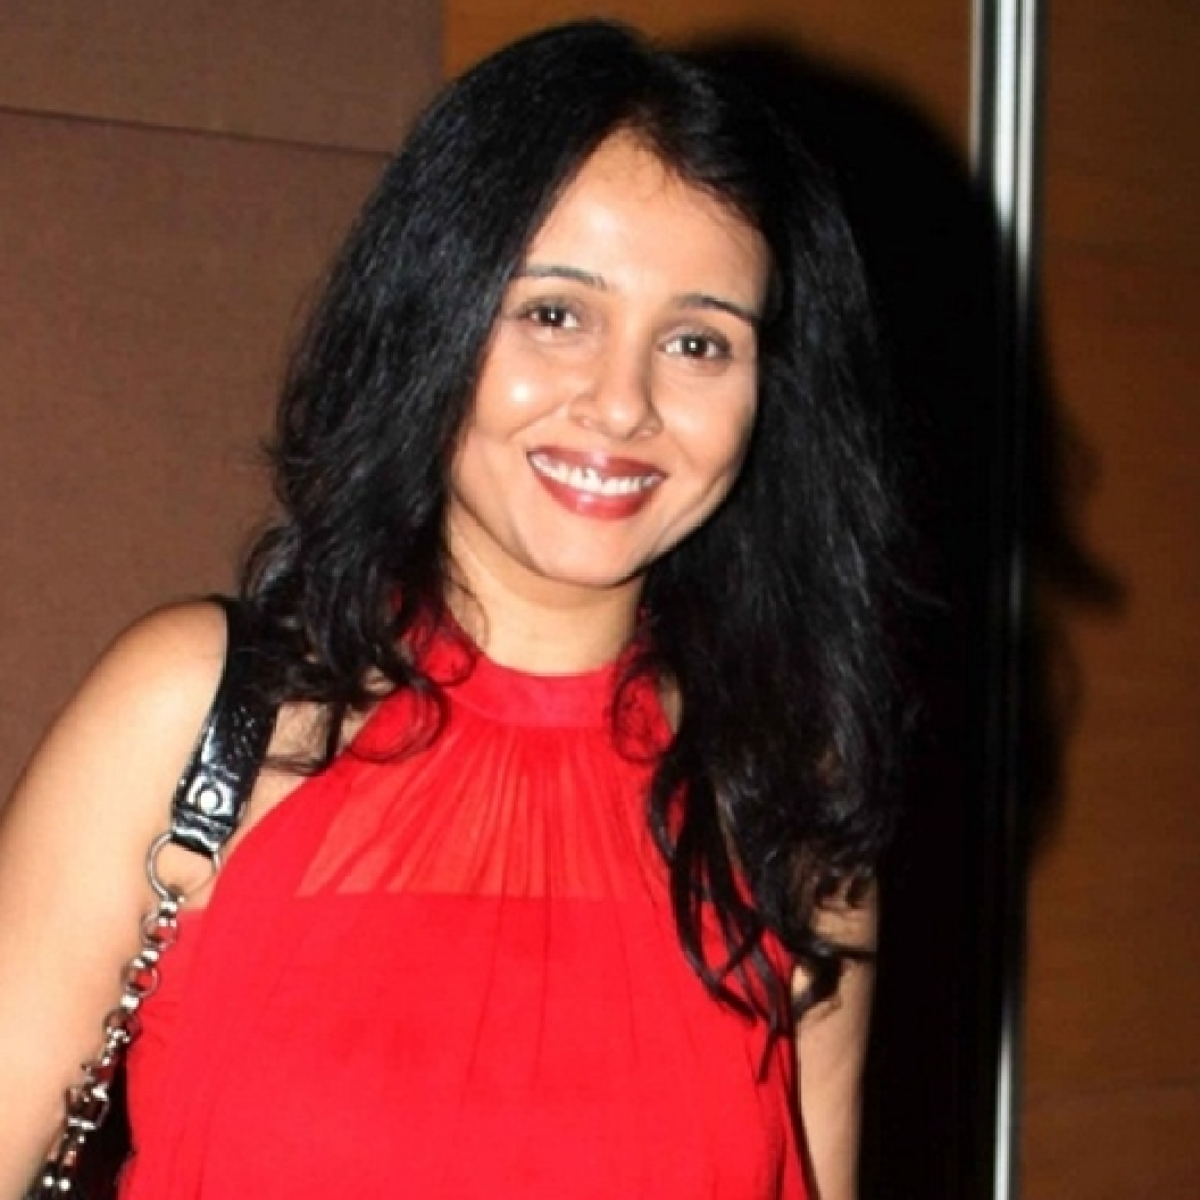 Suchitra Krishnamoorthi uninstalls Swiggy after food delivery app sacks 1,100 employees amid COVID-19 crisis